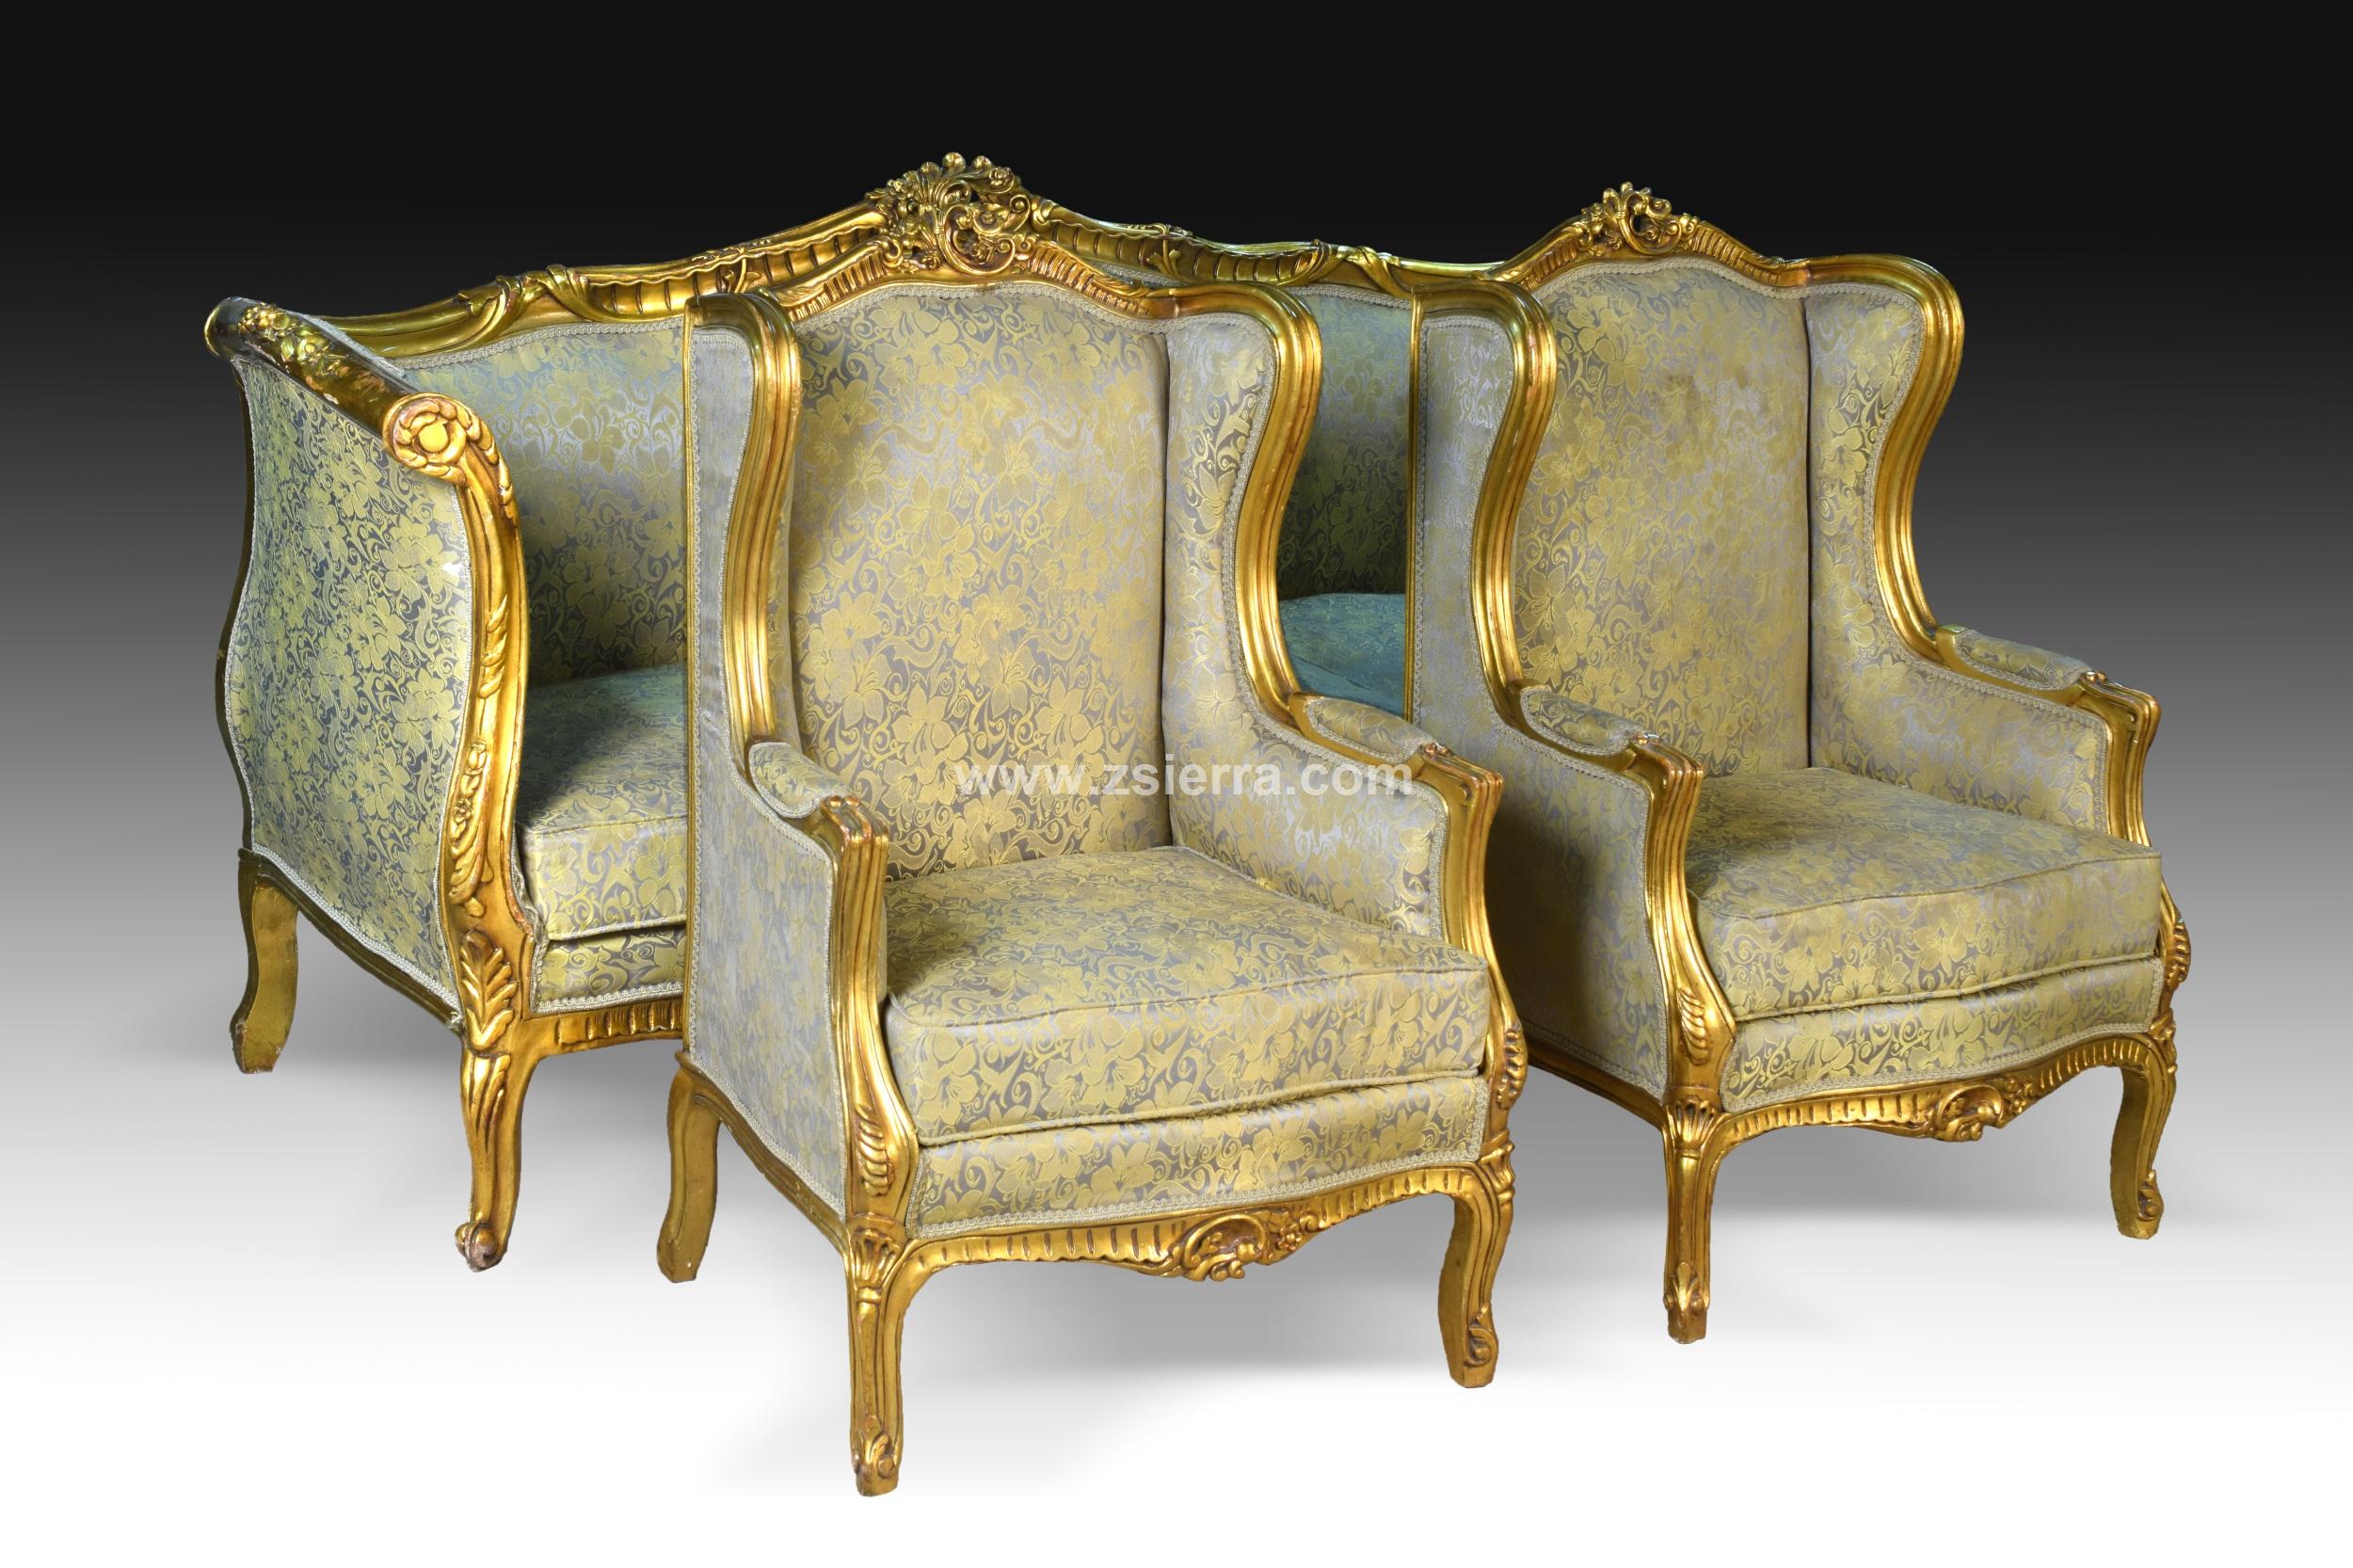 Z sierra antig edades y objetos de decoraci n for Sofa estilo frances